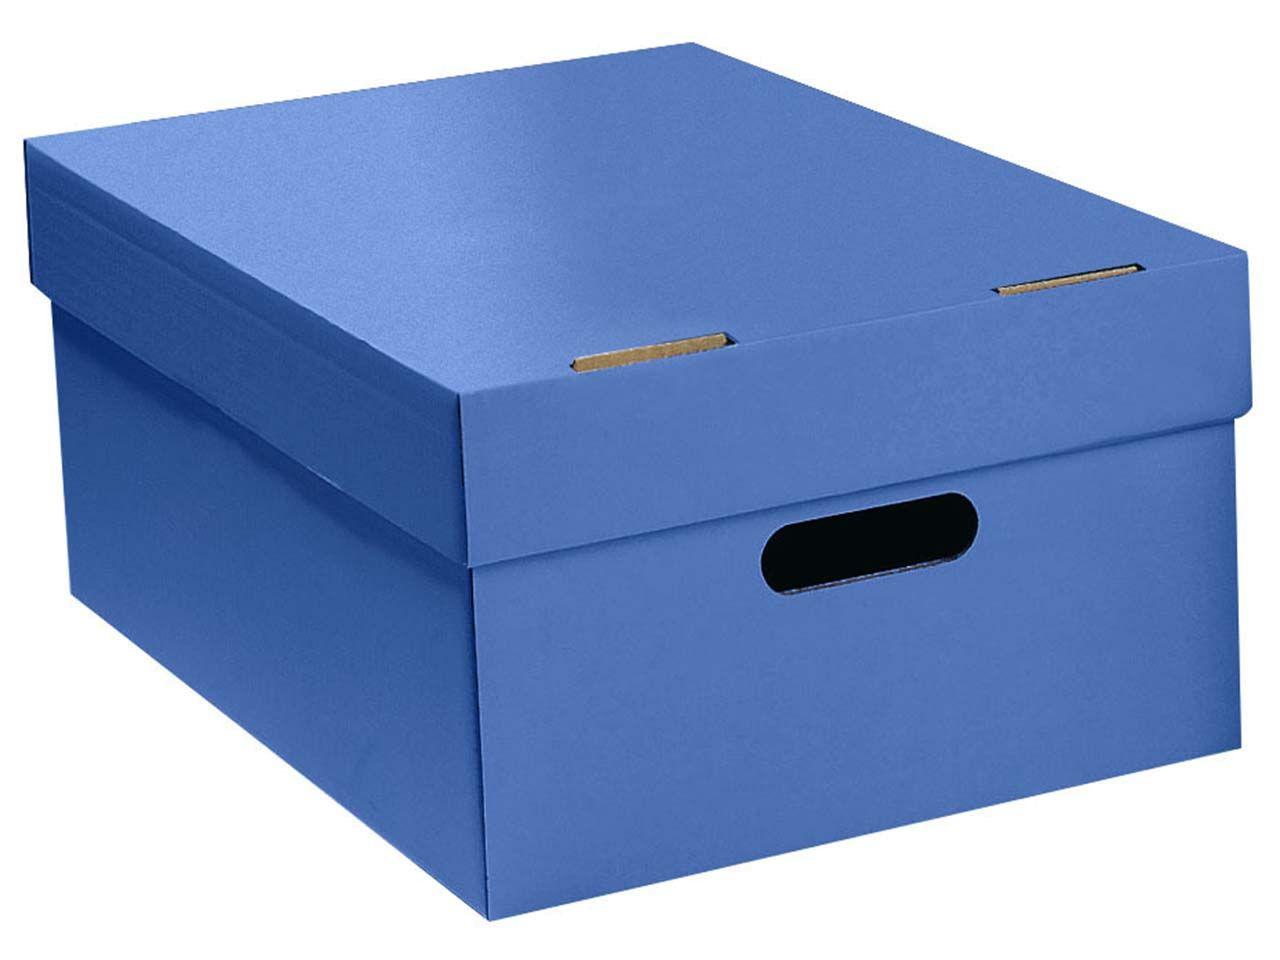 Stülpkiste blau groß 7066blau